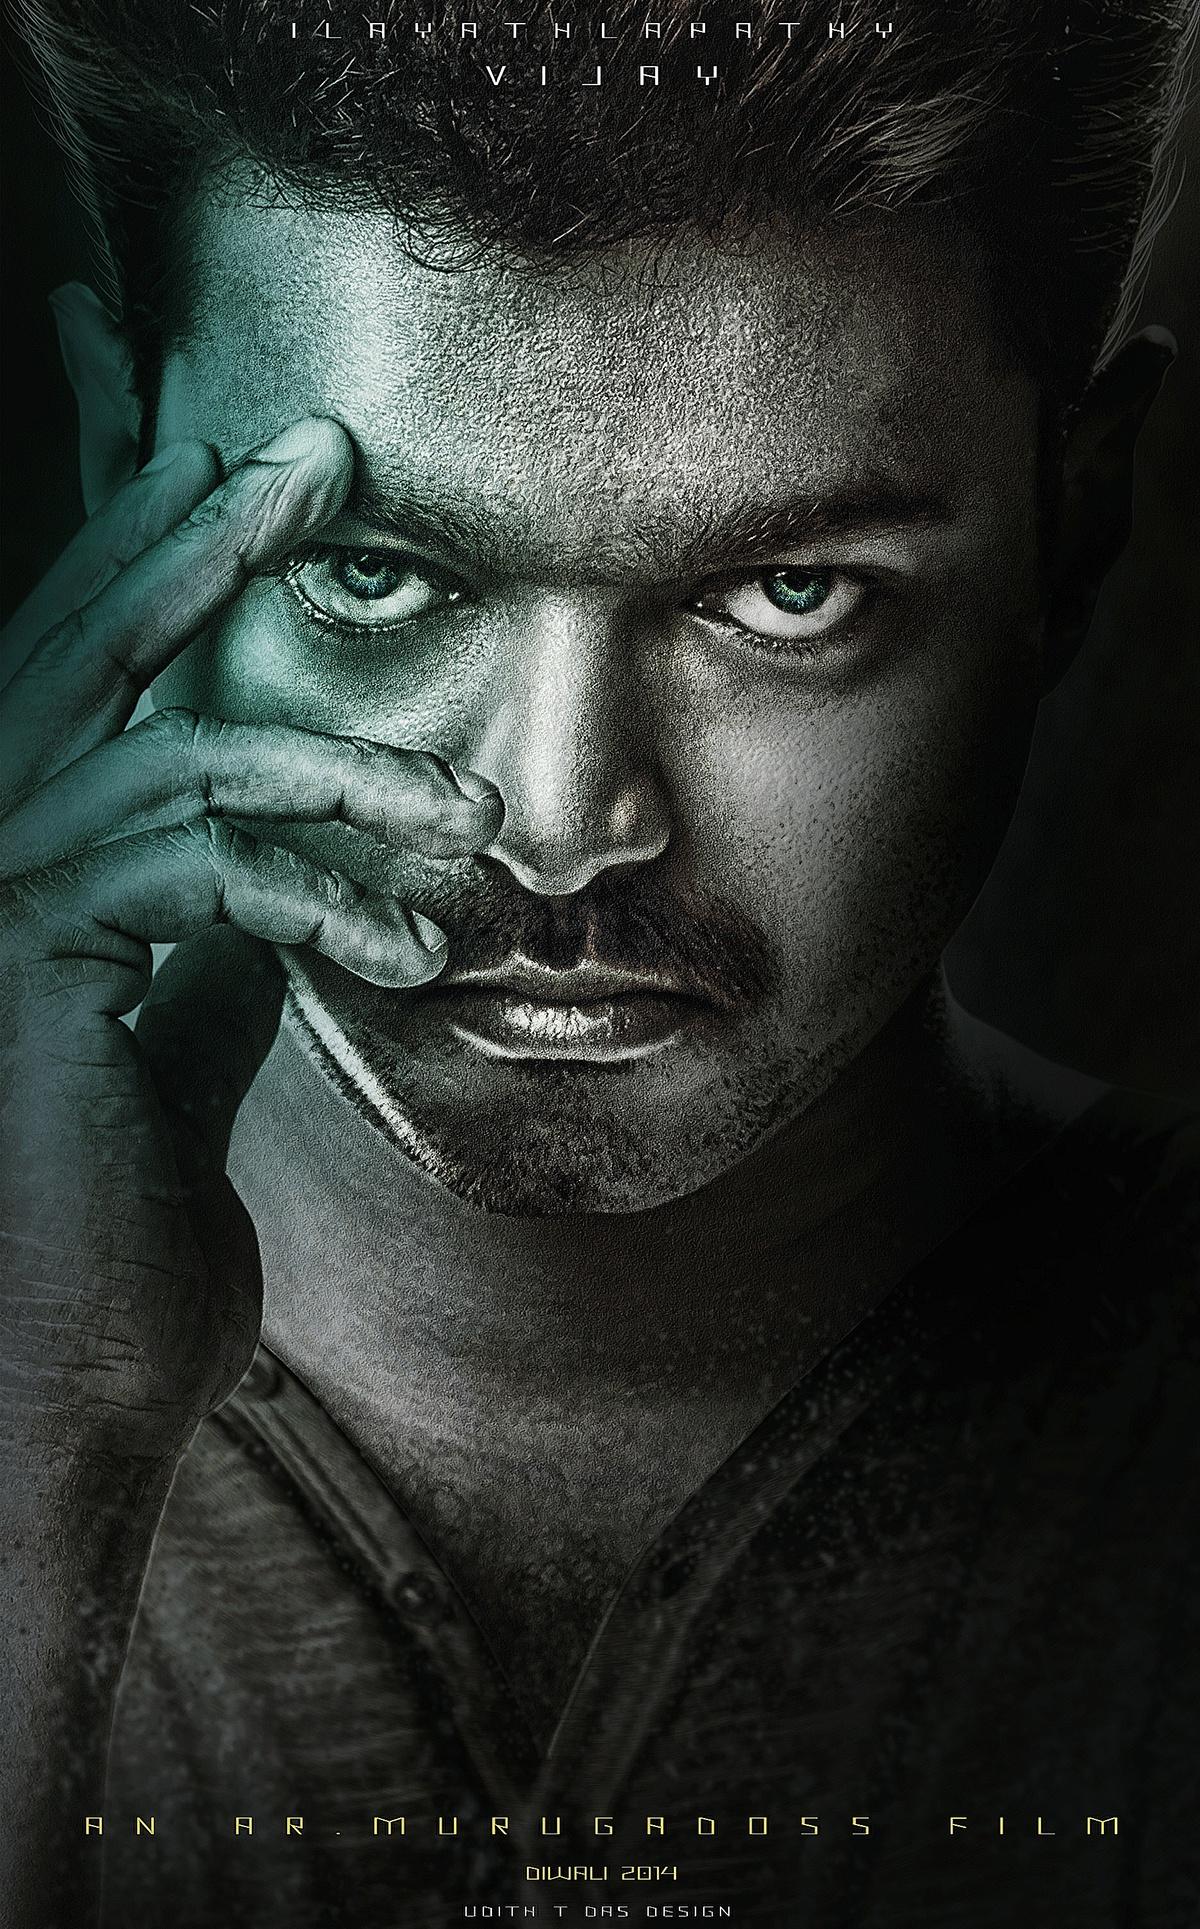 kaththi promo poster on behance